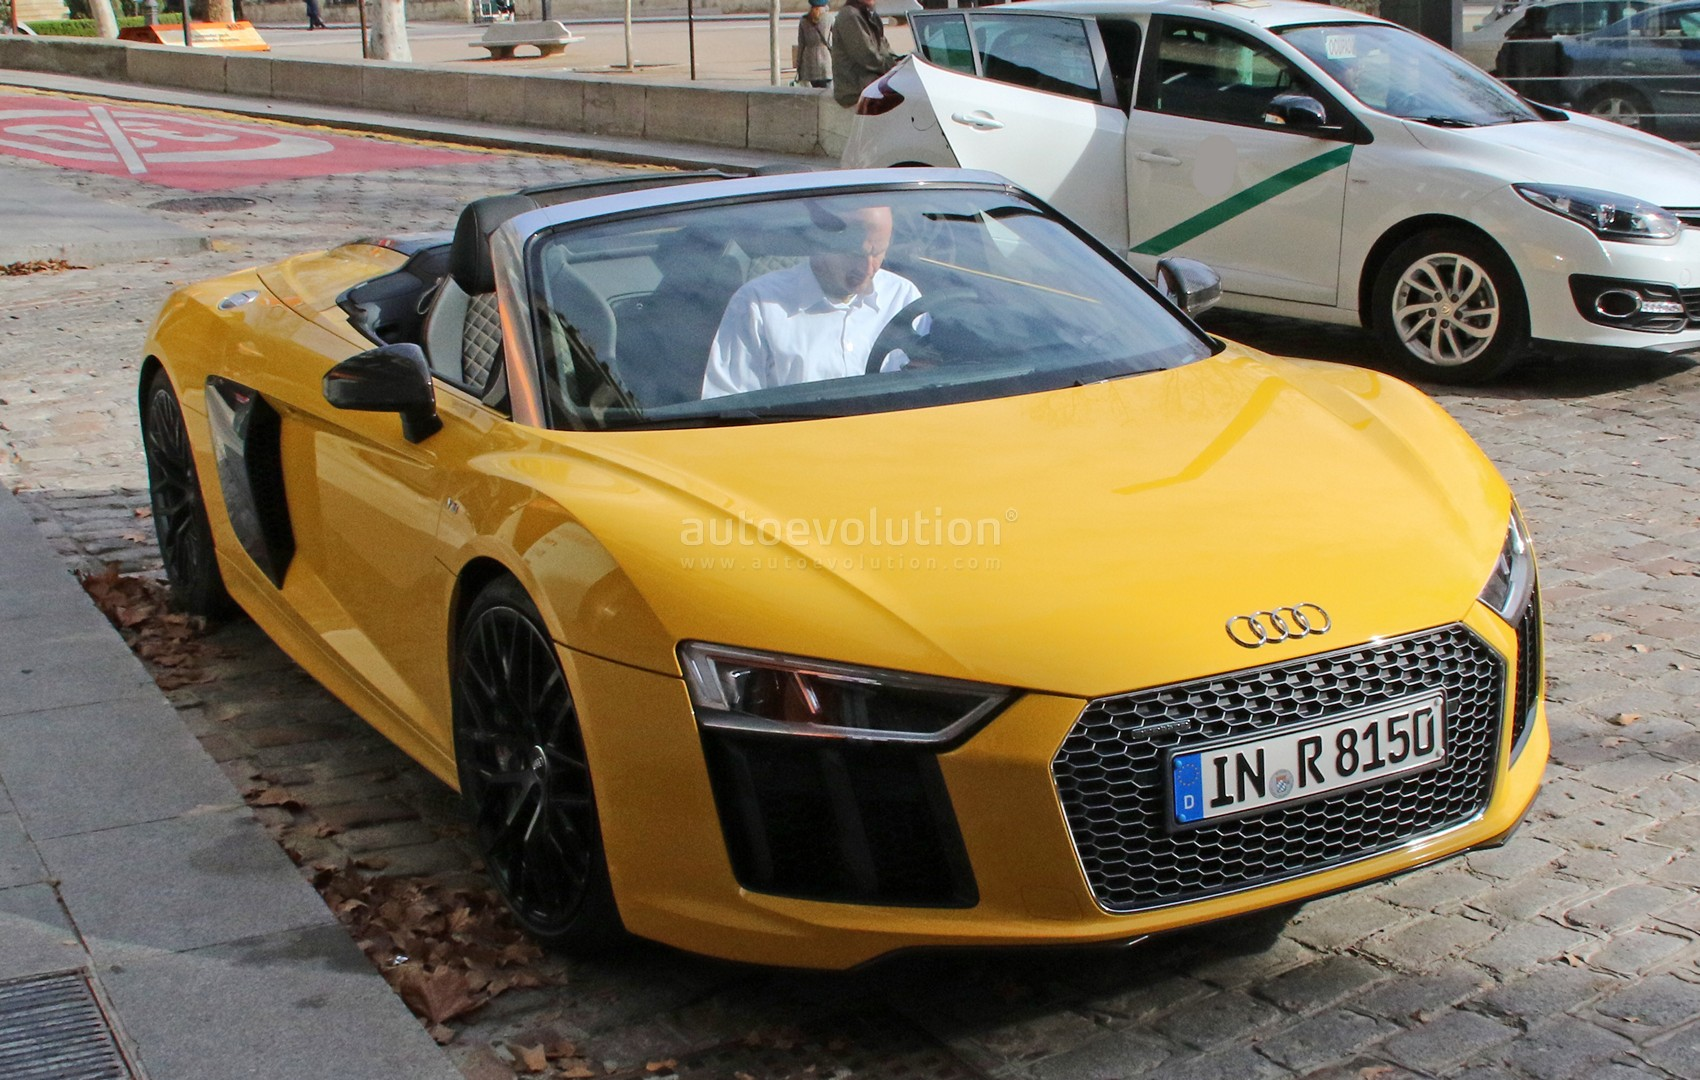 Spyshots: 2017 Audi R8 Spyder Completely Revealed in Vegas Yellow - autoevolution